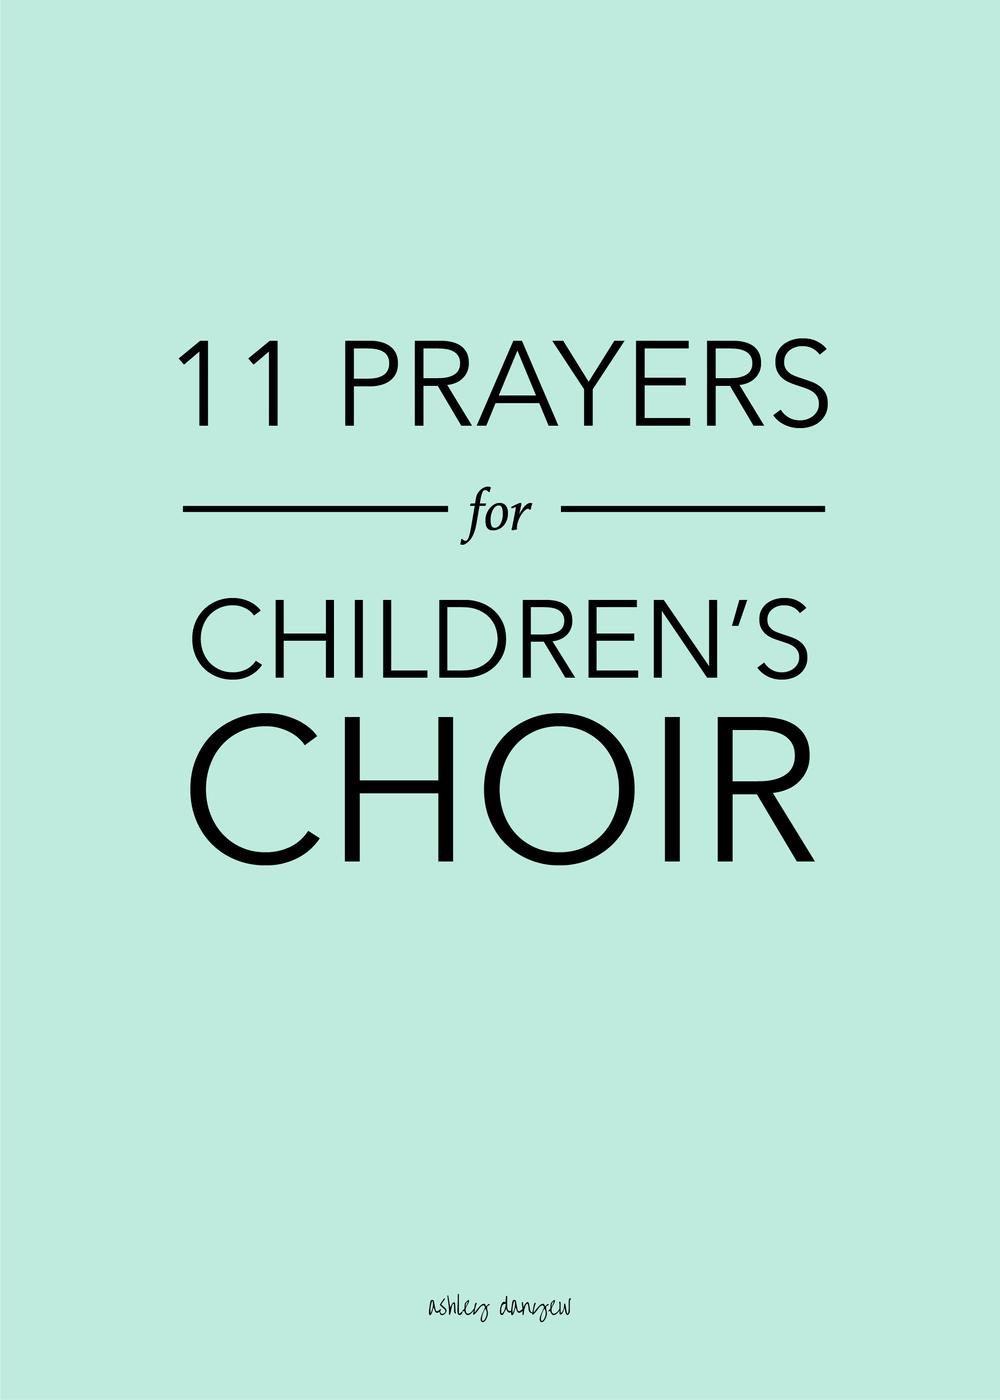 Copy of 11 Prayers for Children's Choir